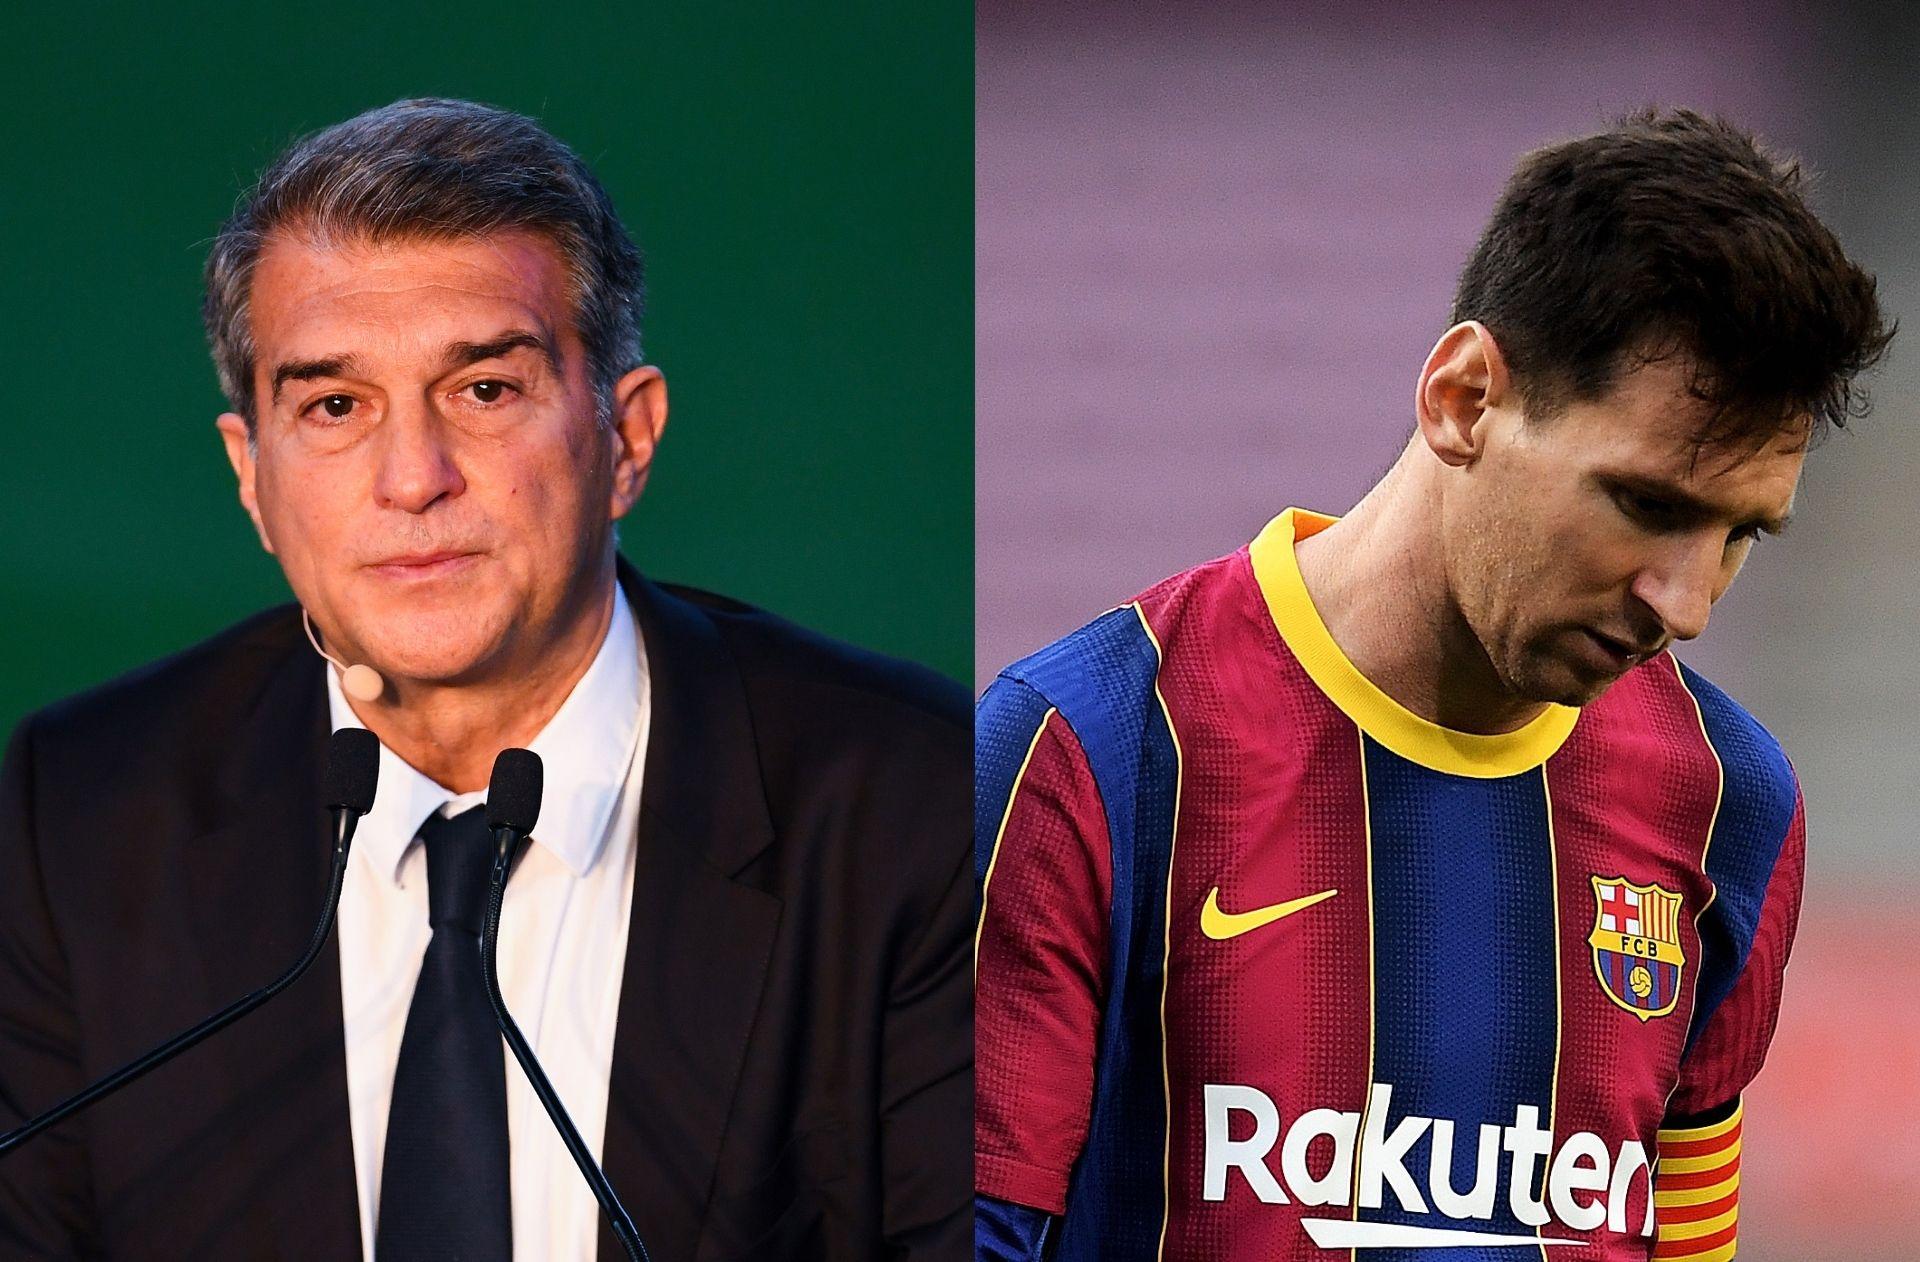 Joan Laporta, Lionel Messi